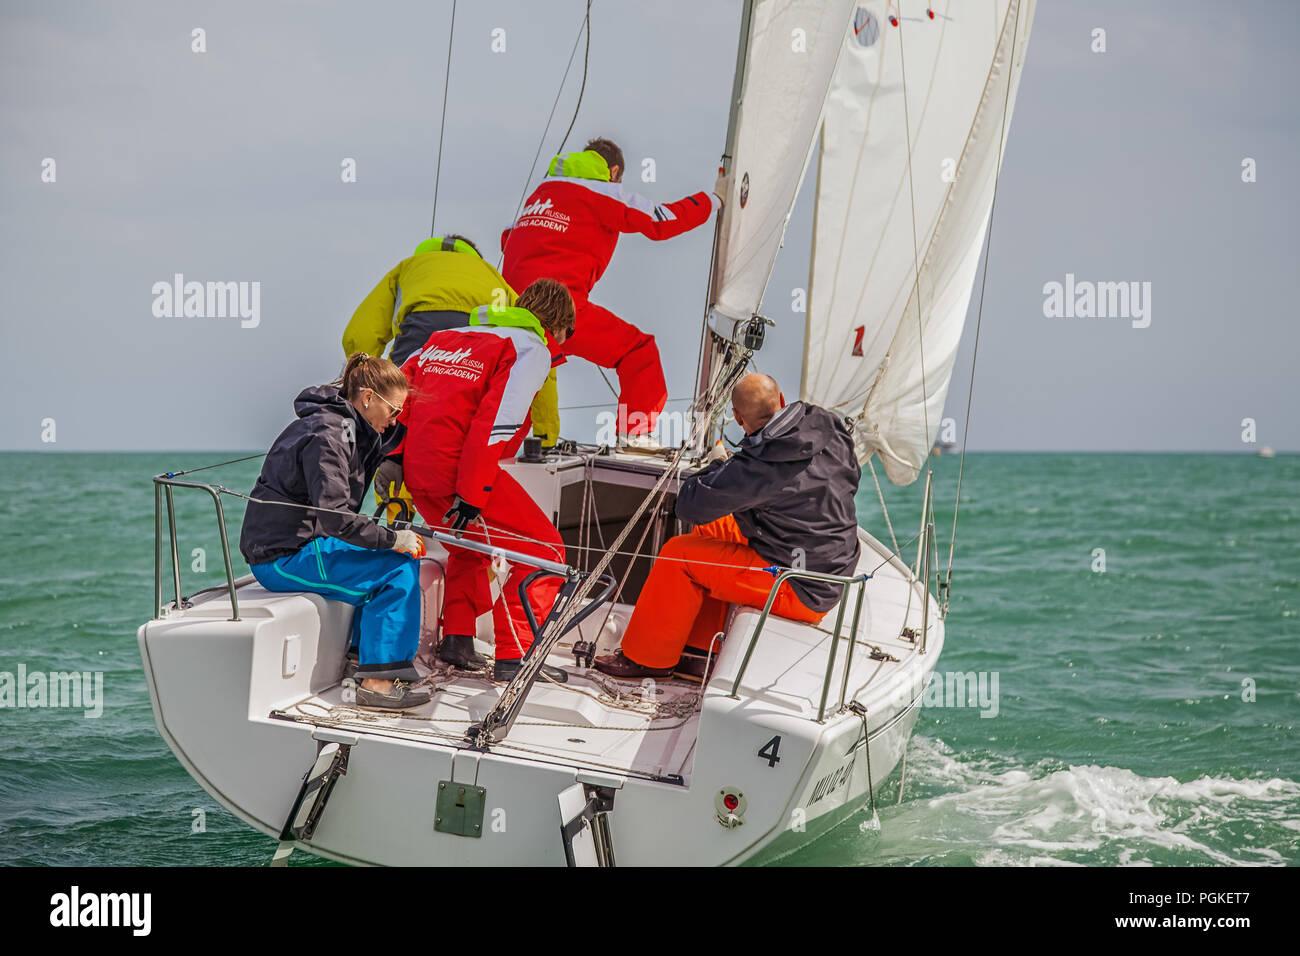 SOCHI, RUSSIA - MAY 21, 2016: Yachtsmen on the yacht Elan 210 - Stock Image